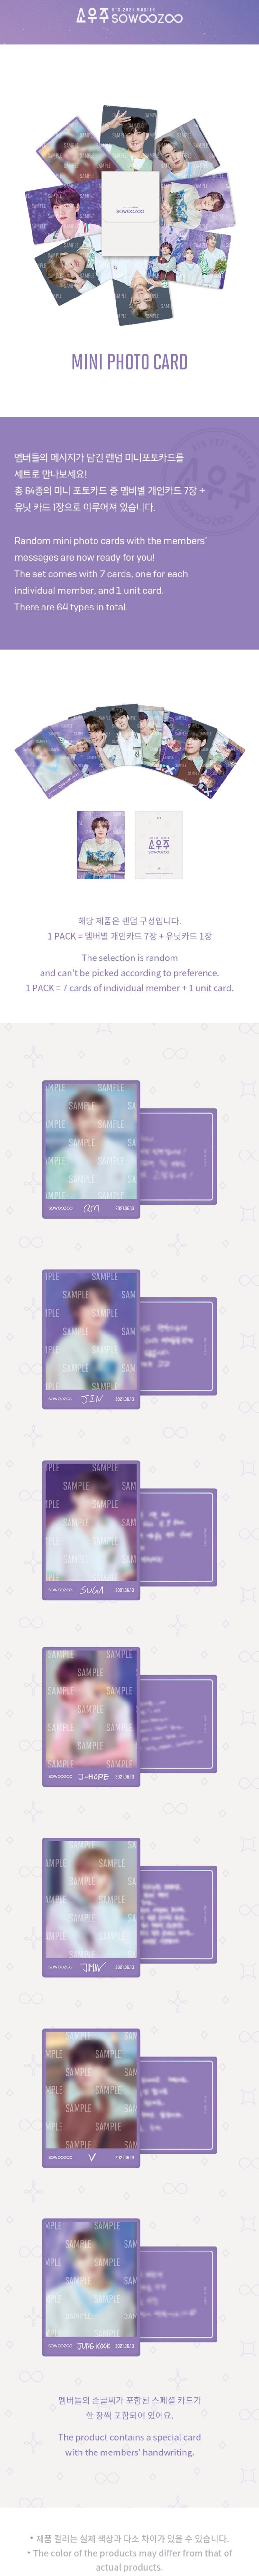 BTS SoWooZoo Mini Photo Card